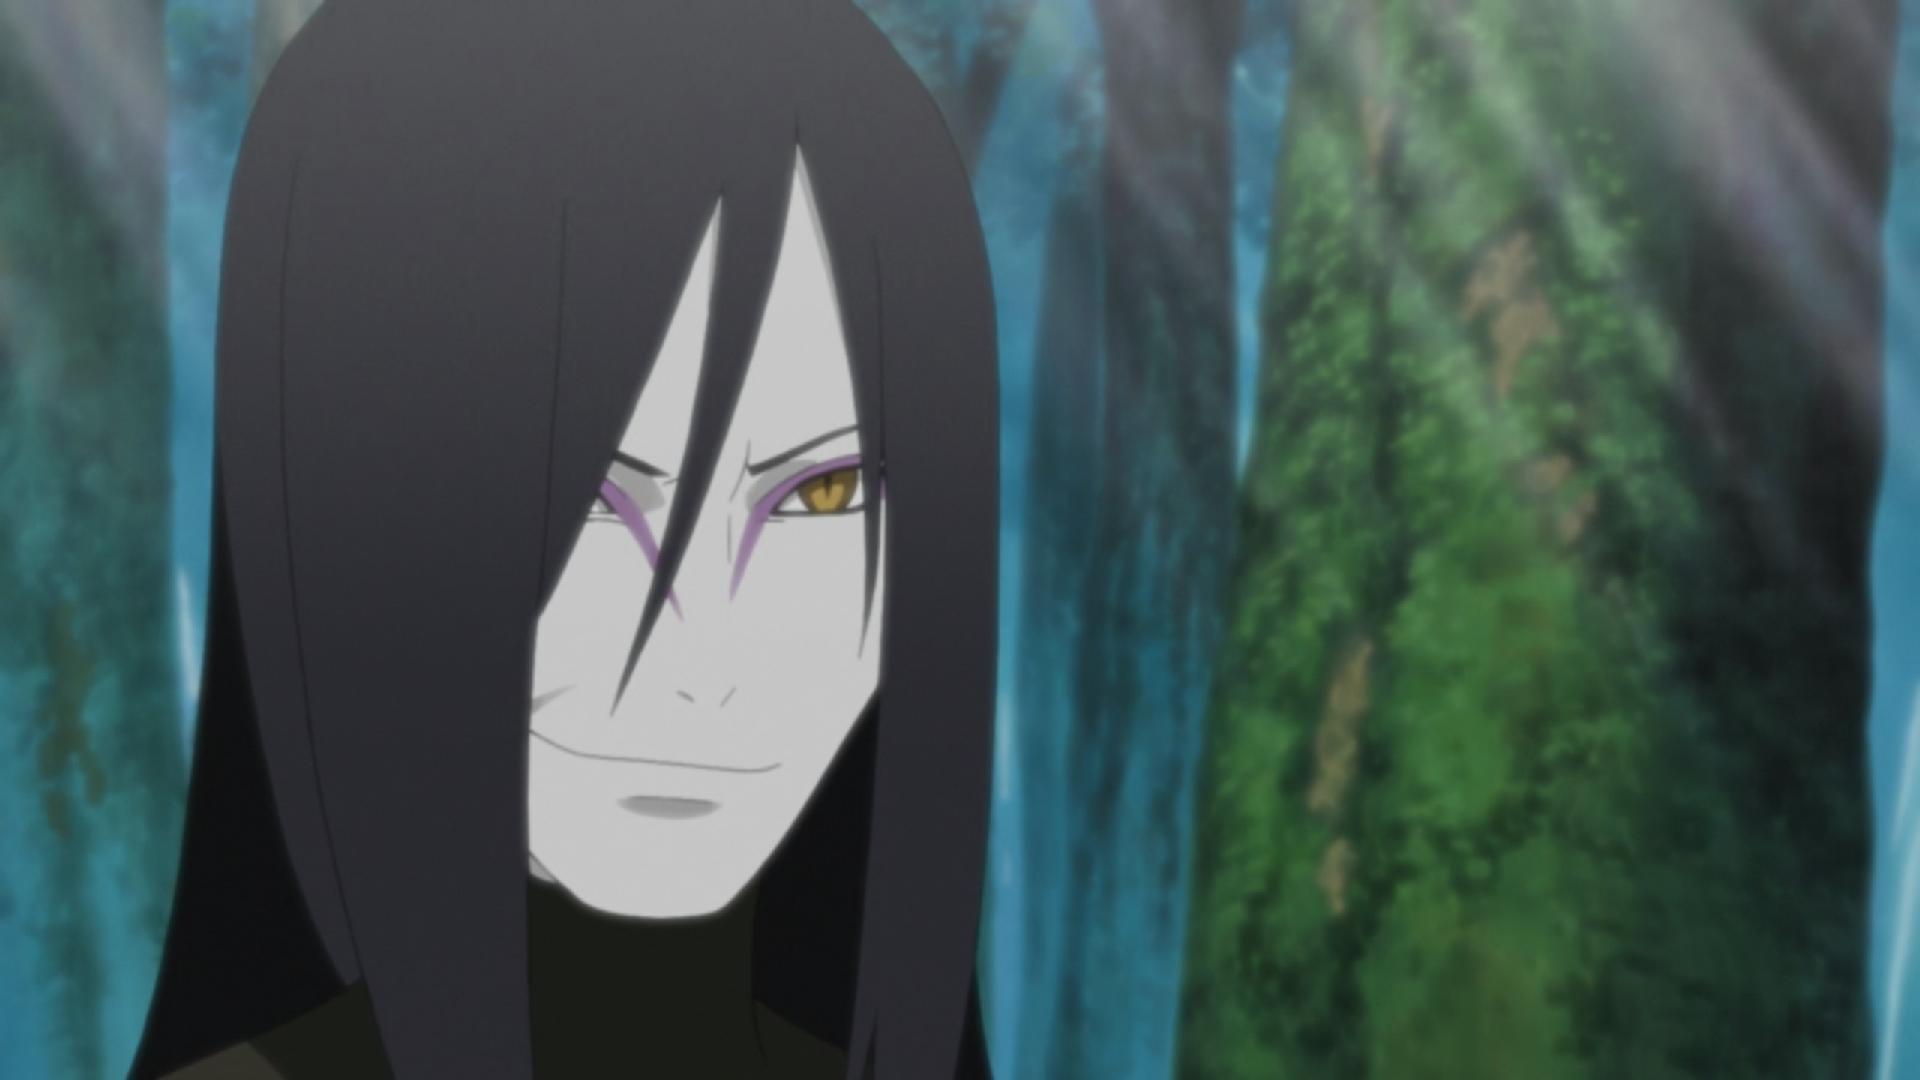 Naruto Hd Wallpapers Widescreen Orochimaru Hd Wallpaper Background Image 1920x1080